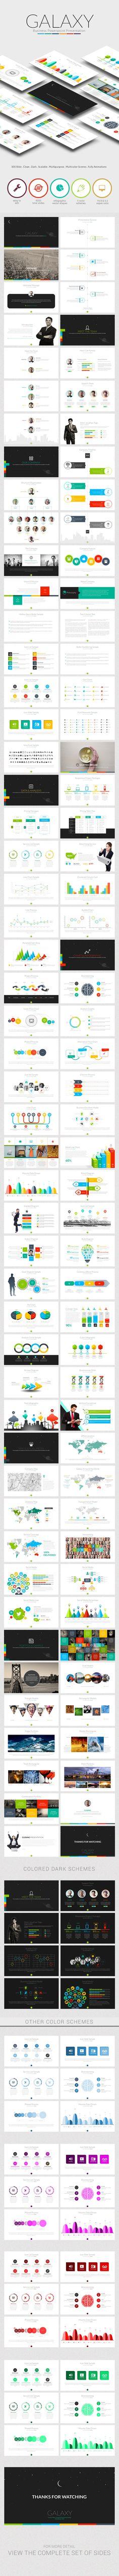 Galaxy Business Powerpoint Template #design #slides Download: http://graphicriver.net/item/galaxy-business-powerpoint/13460560?ref=ksioks